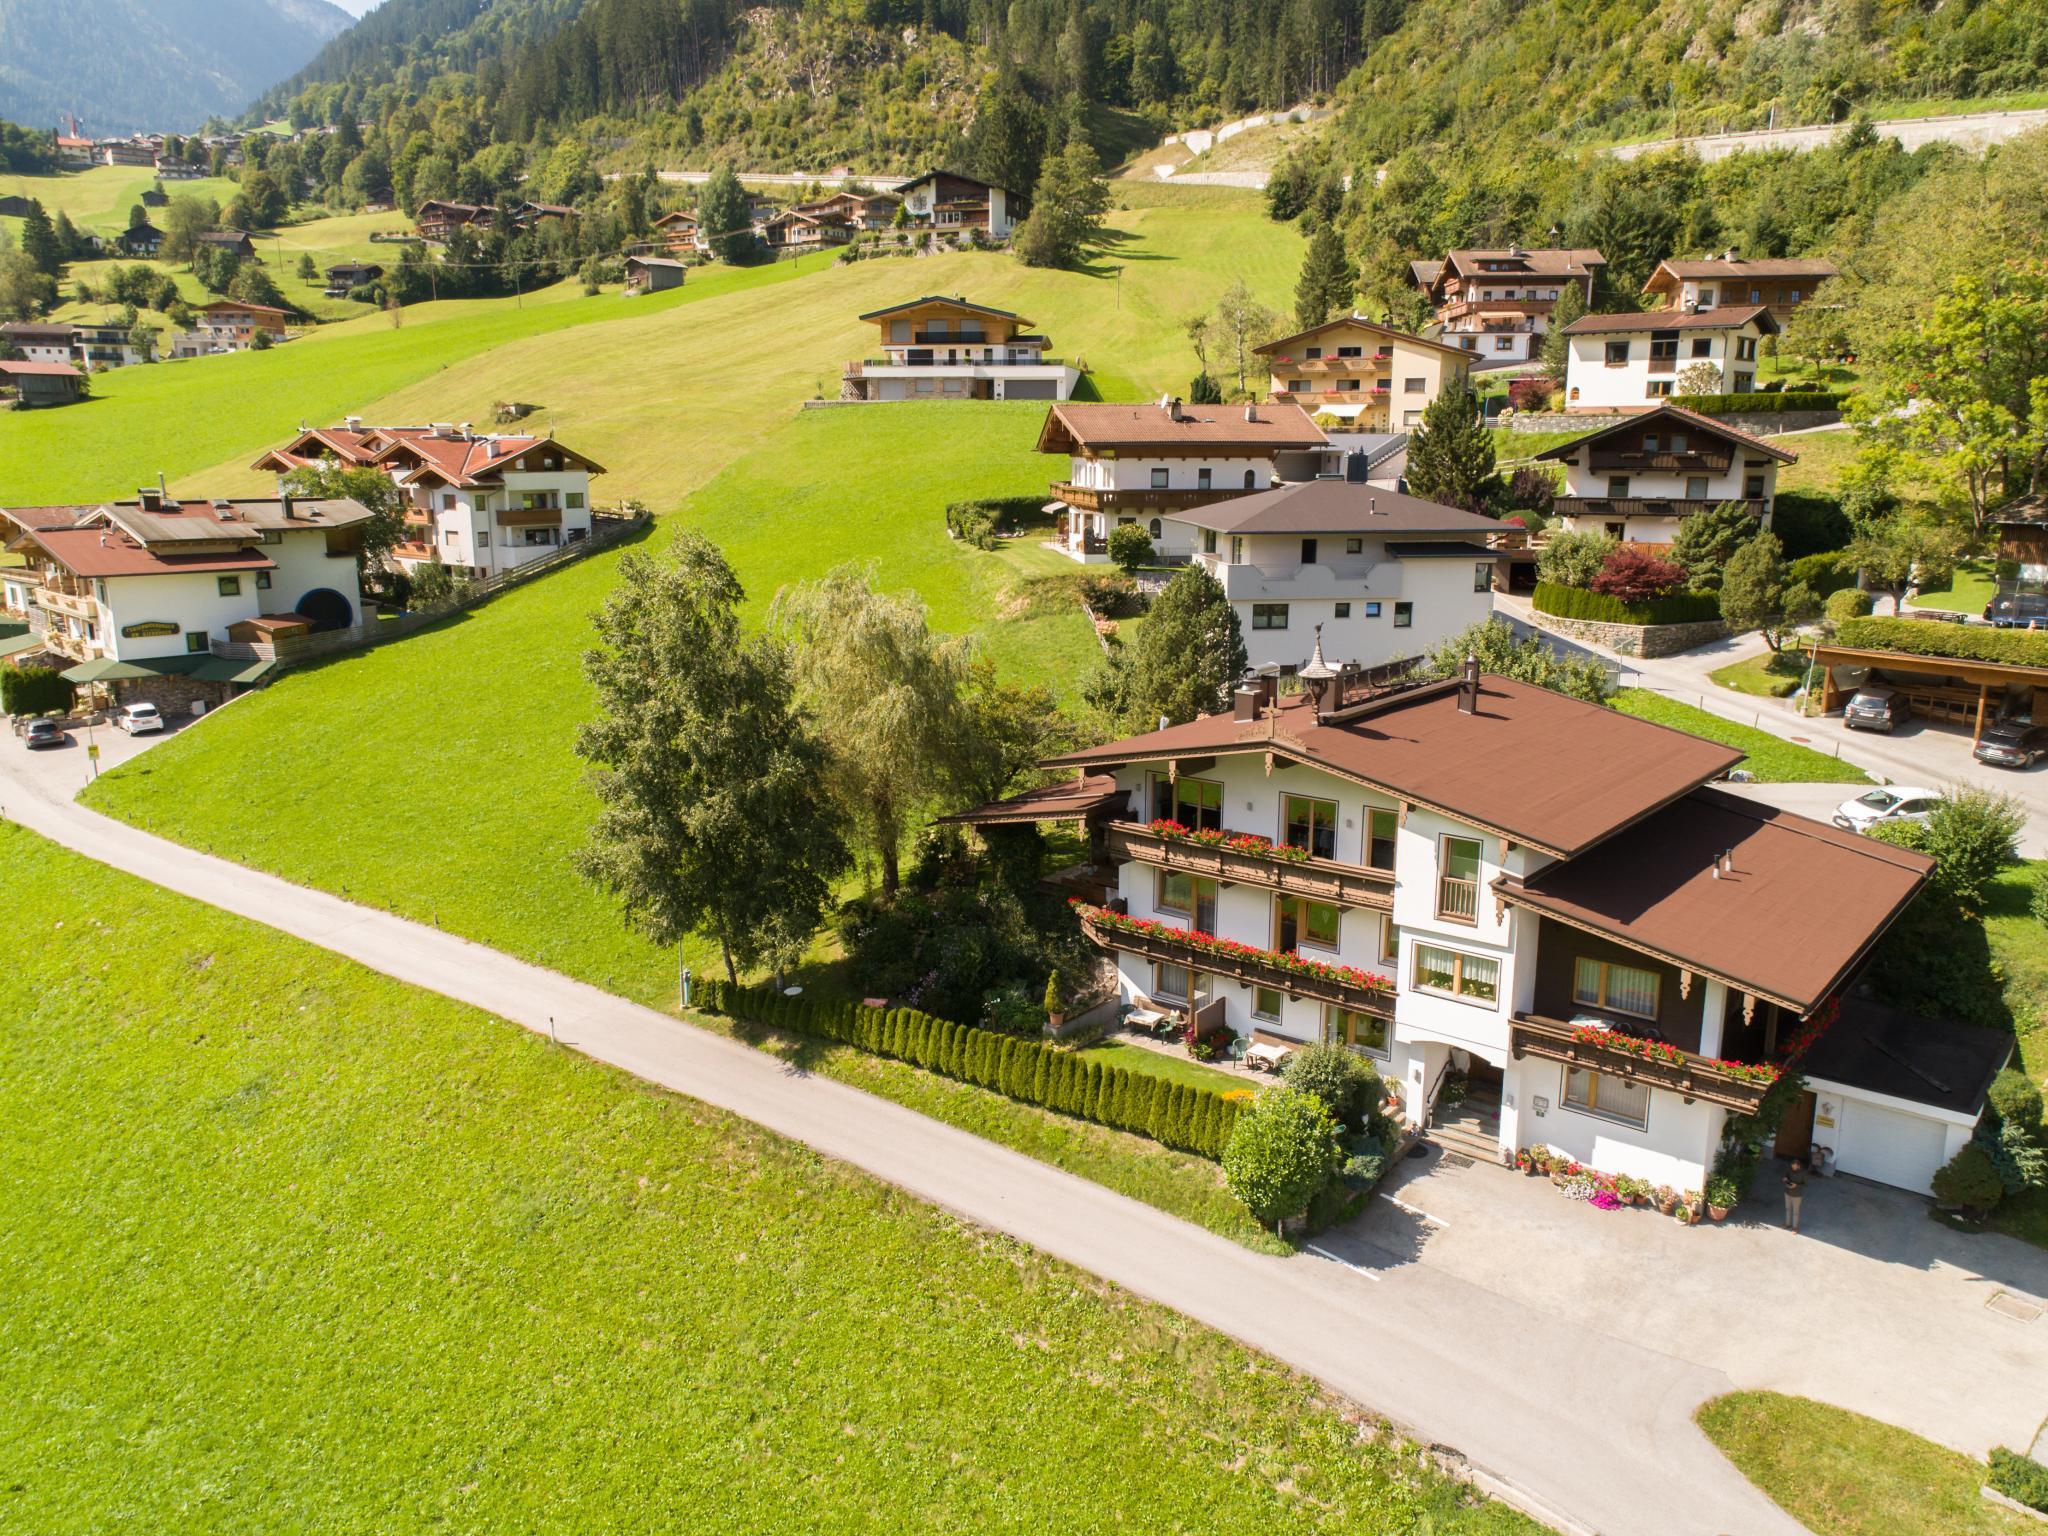 Ferienhaus Oblasser II Tirol